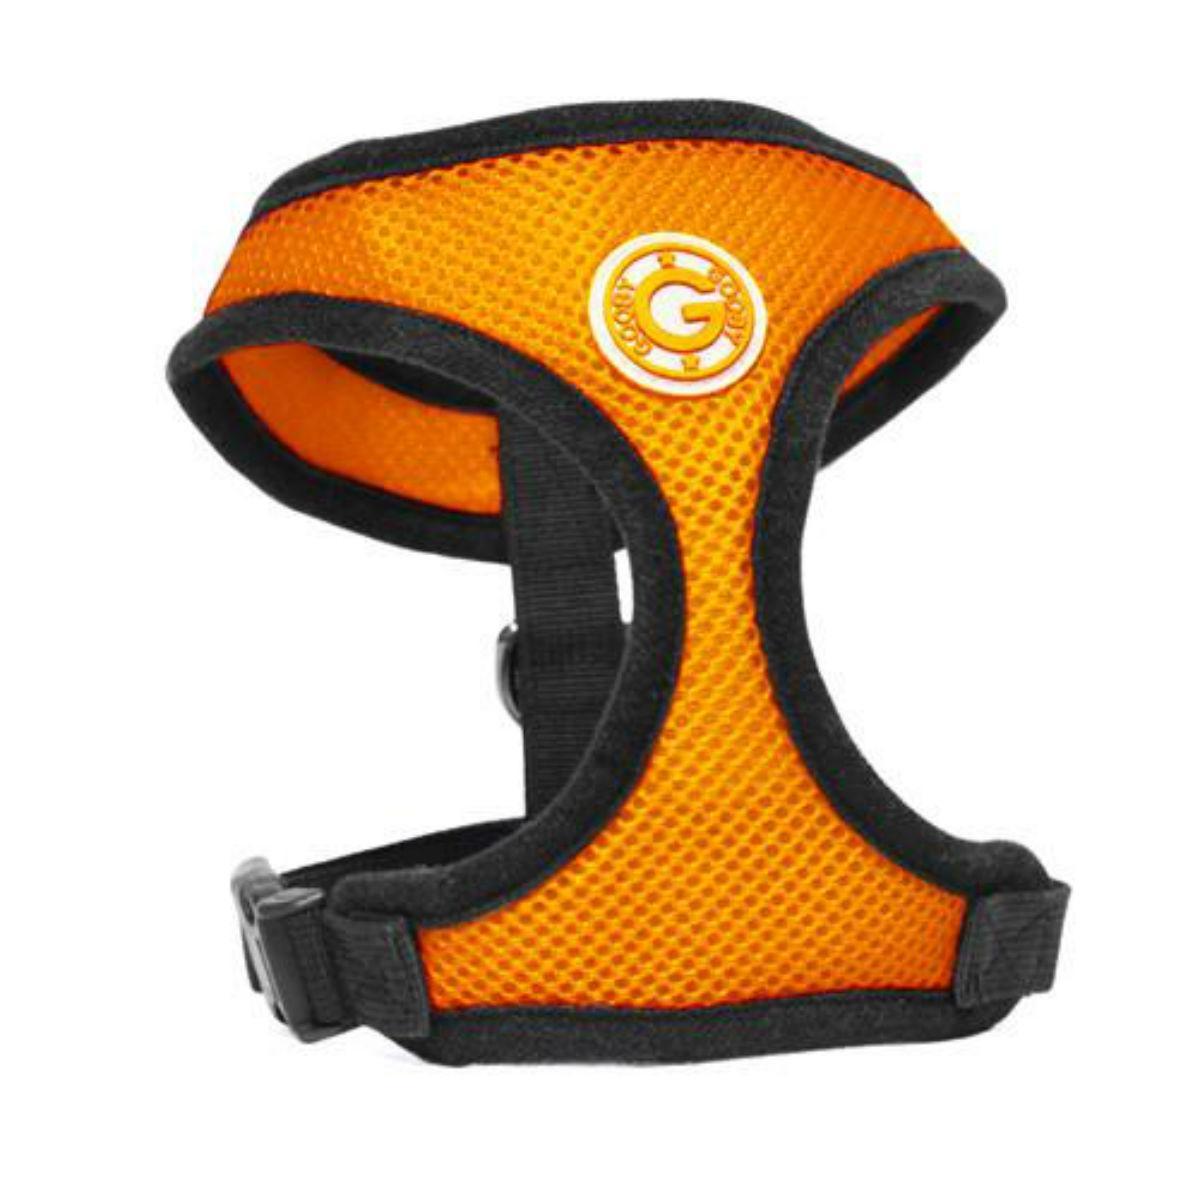 Gooby Soft Mesh Dog Harness - Orange